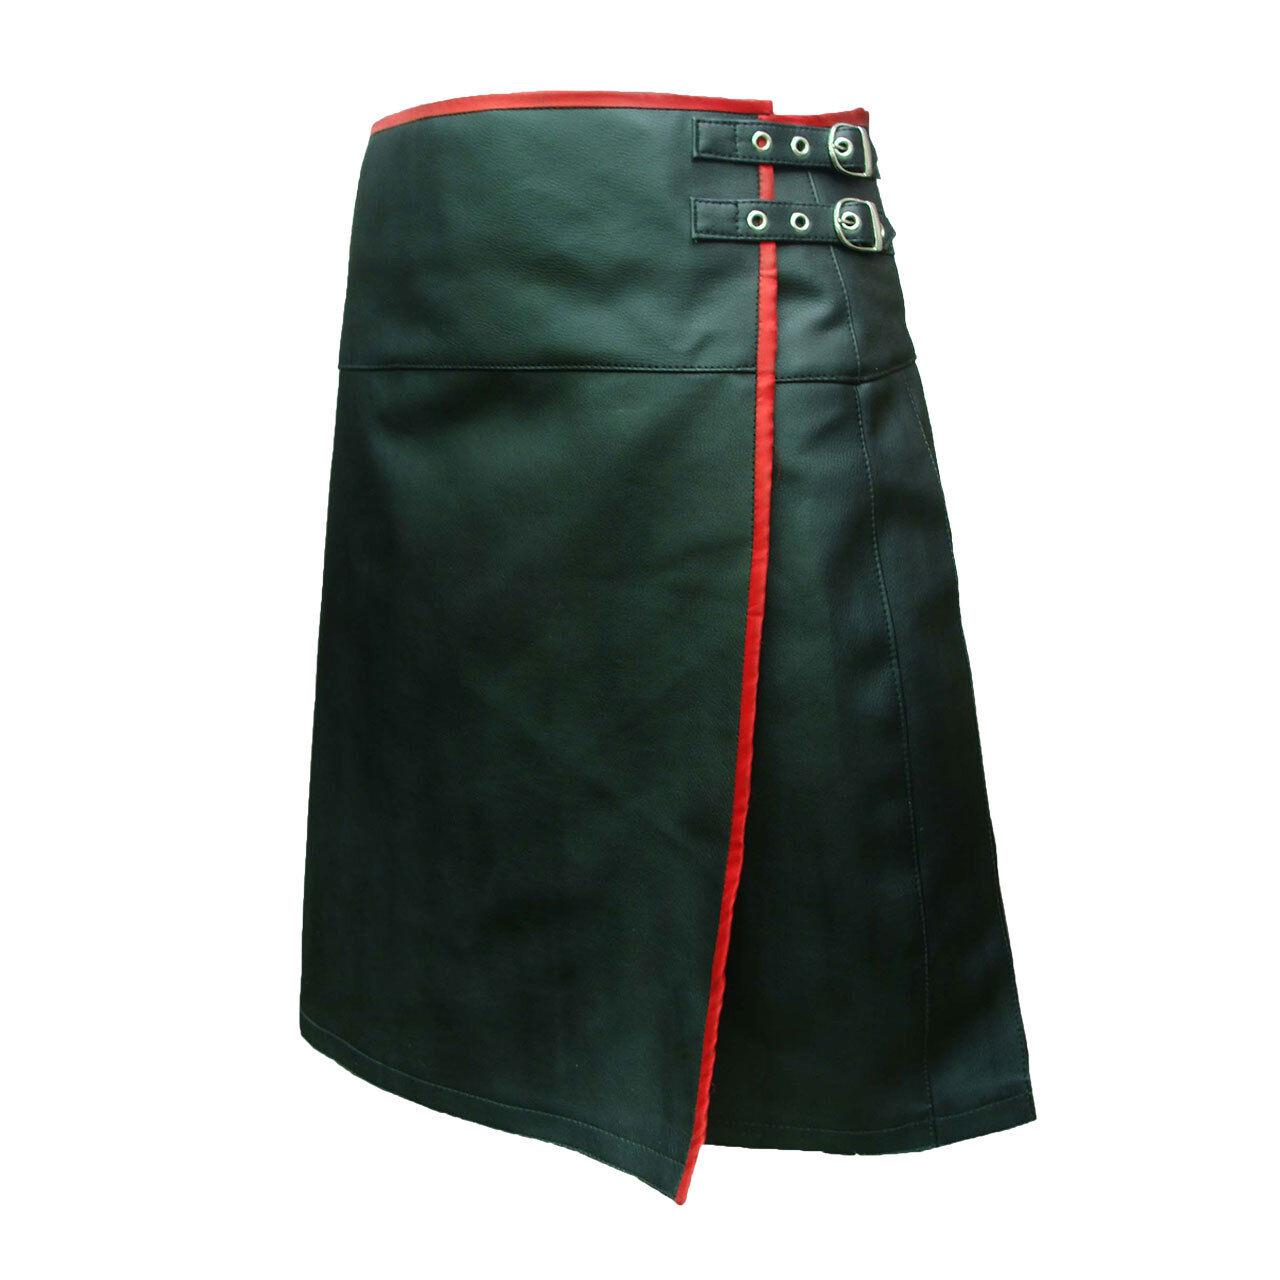 Men Kilt Black Leather Pleated LARP Utility Flat Front Pocket Wrap Style